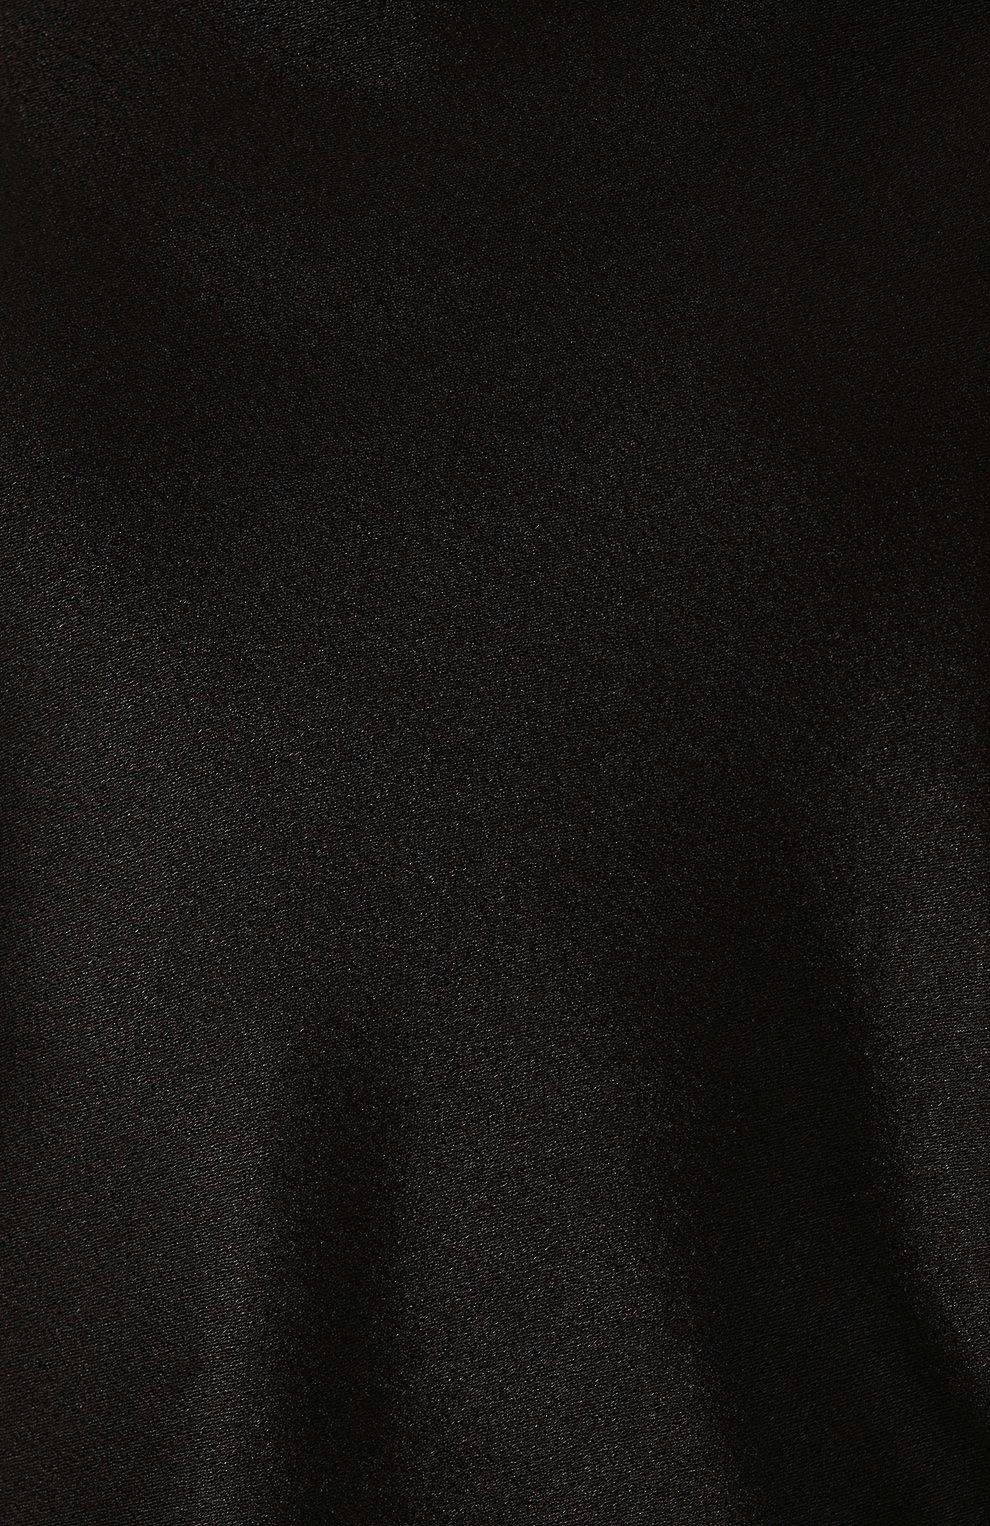 Женский топ ALICE + OLIVIA черного цвета, арт. CC000205011 | Фото 5